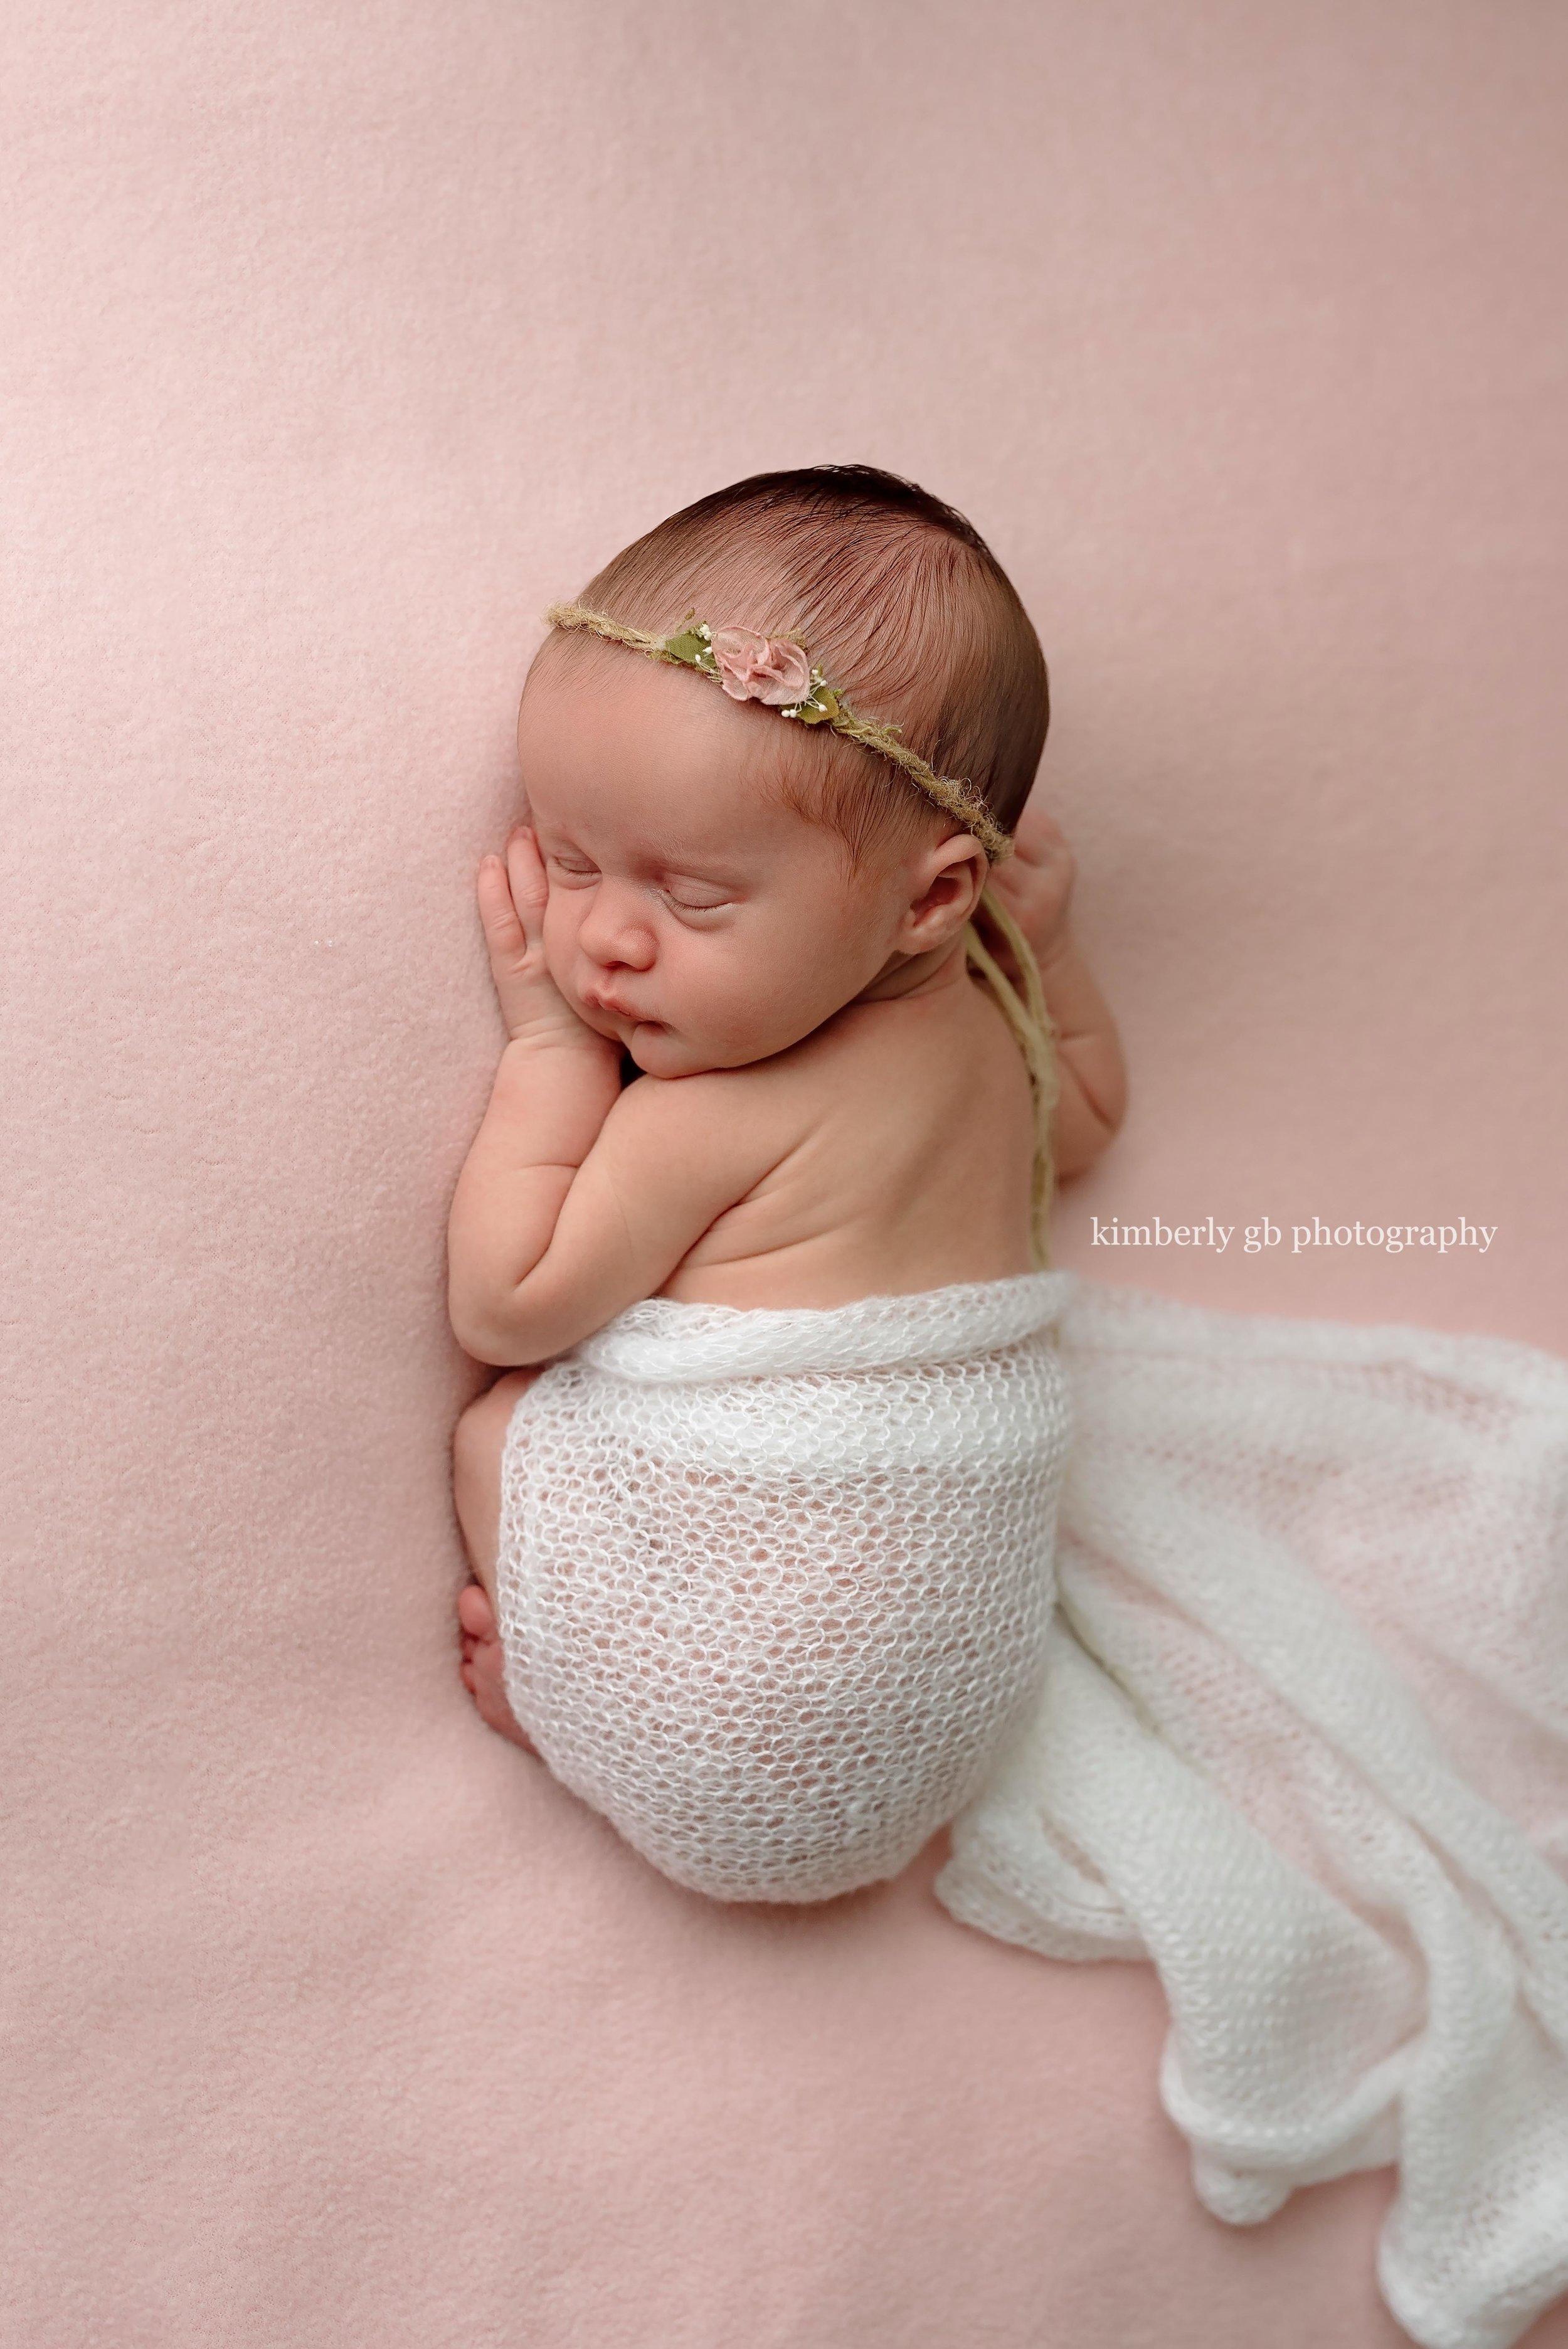 fotografia-de-recien-nacidos-bebes-newborn-en-puerto-rico-kimberly-gb-photography-fotografa-288.jpg